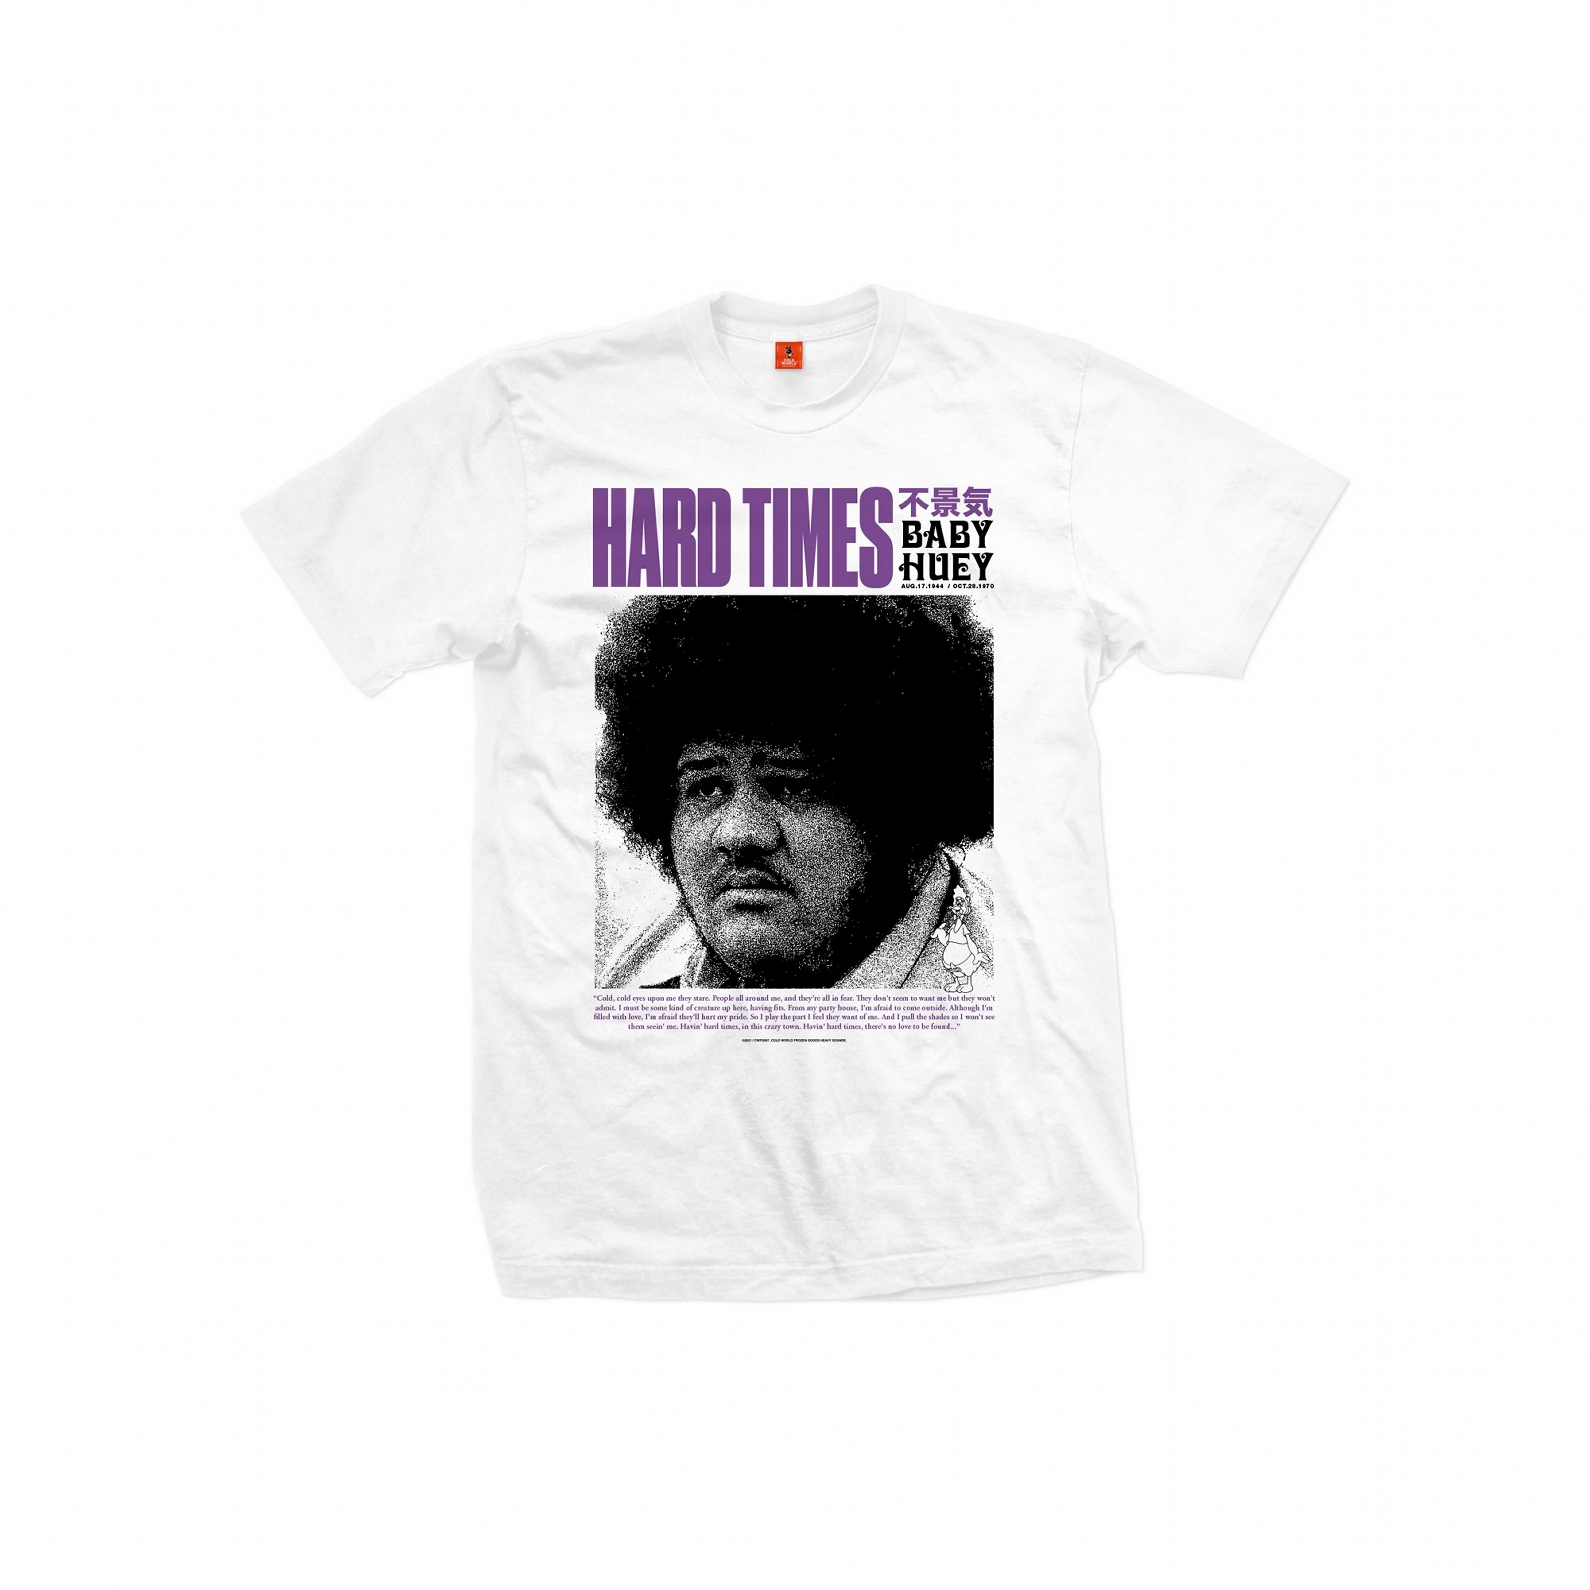 【COLD WORLD FROZEN GOODS/コールドワールドフローズングッズ】HARD TIMES T-SHIRT Tシャツ / WHITE